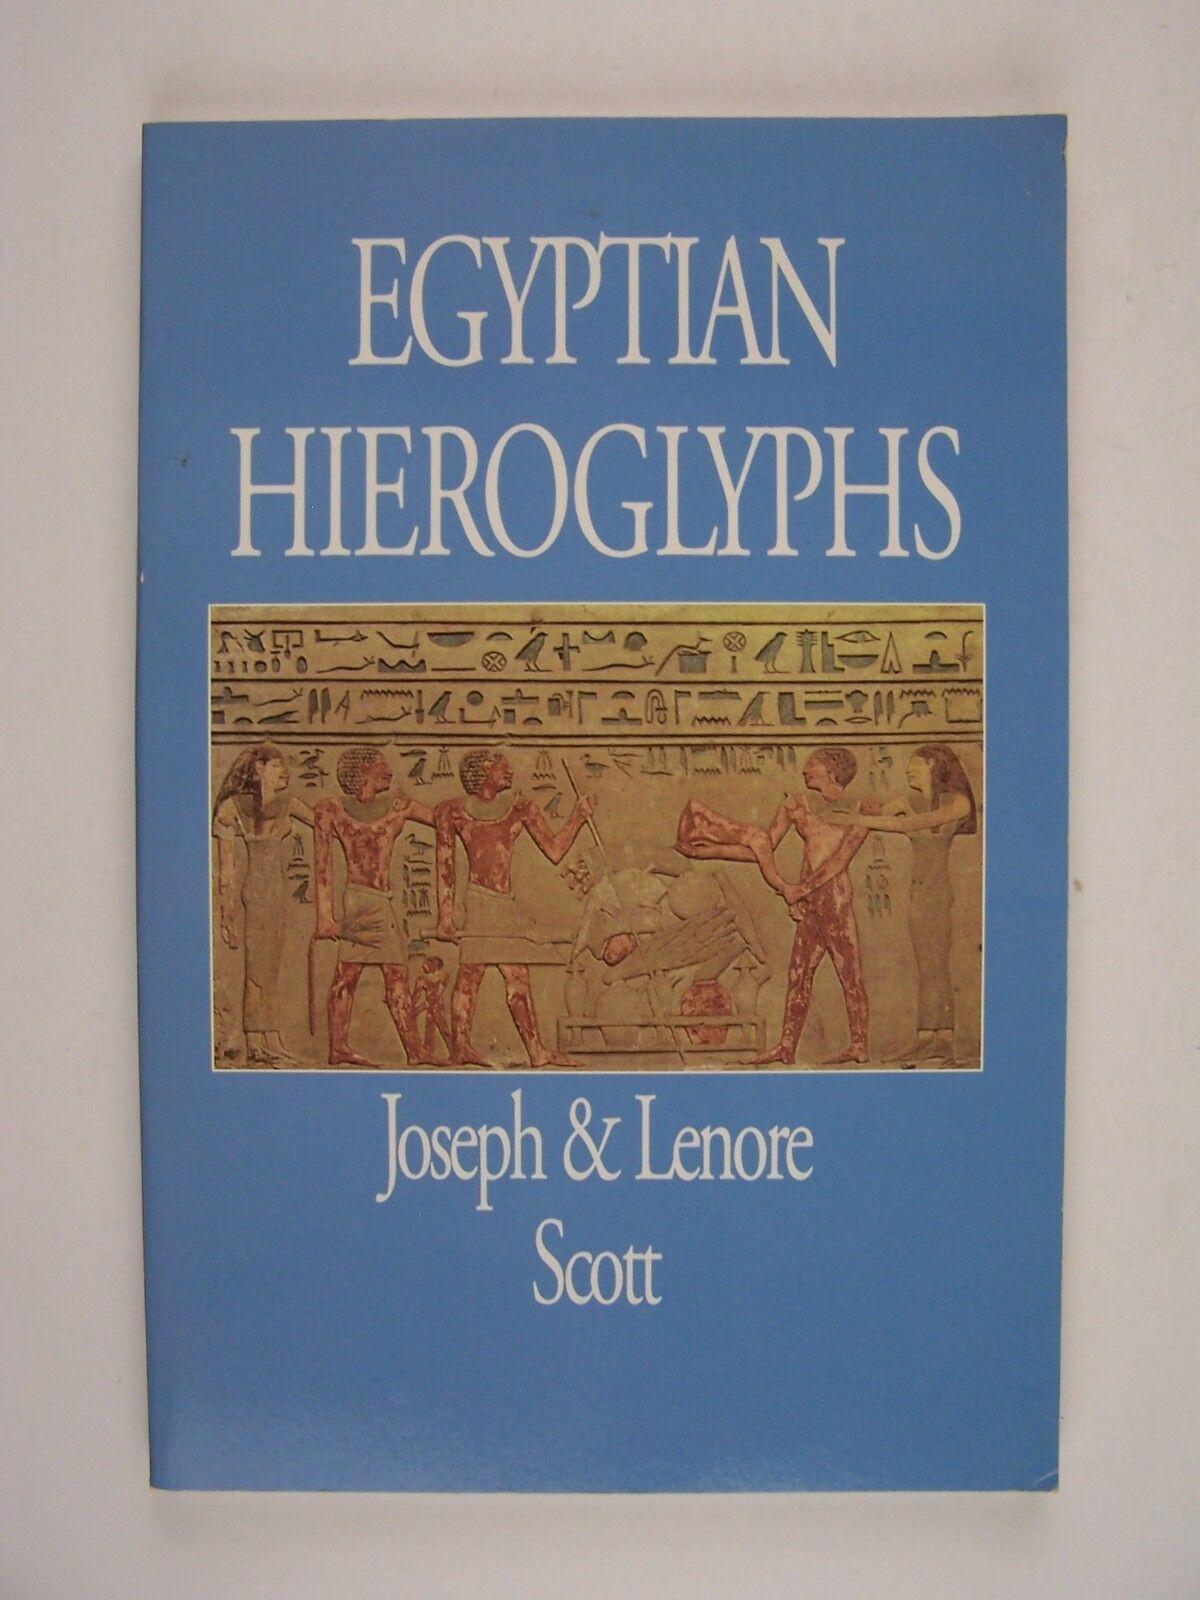 Egyptian Hieroglyphics Paperback by Scott